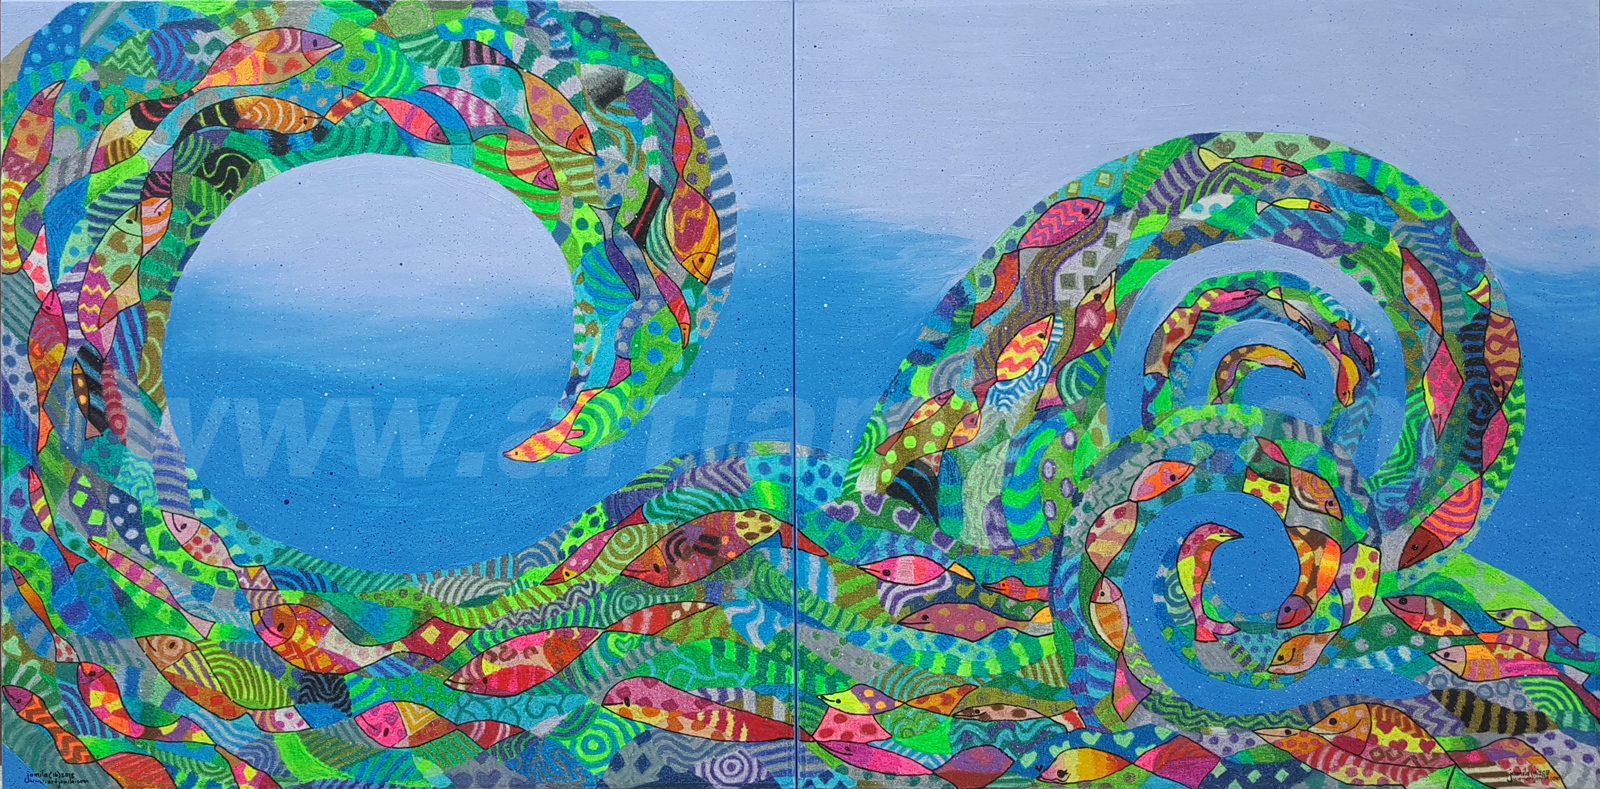 Fishmosaic Wave Series 1A&1B.WATERMARK. 6x3